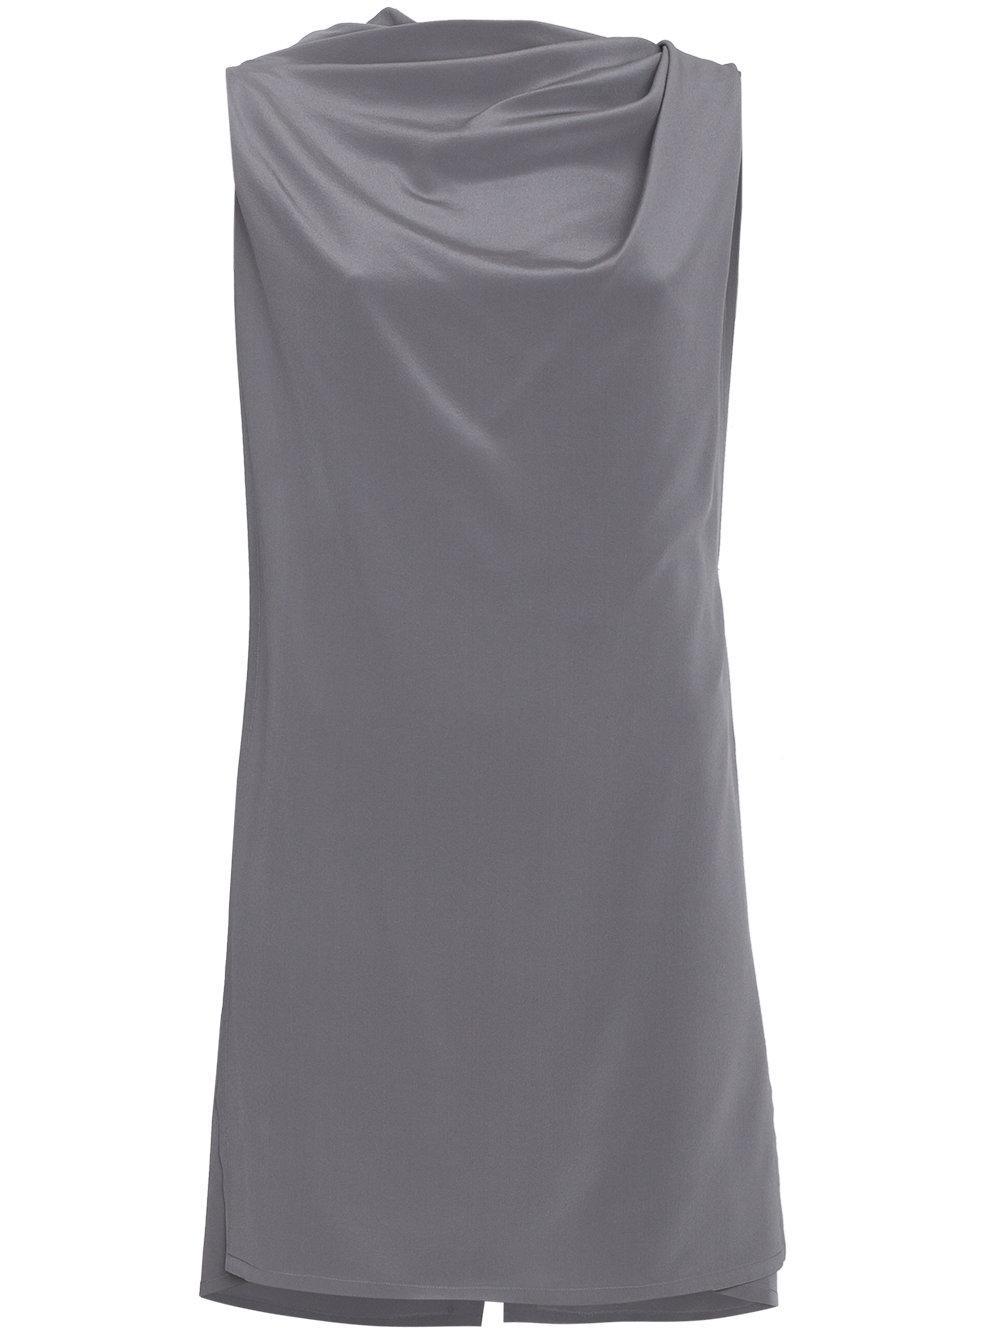 Rick Owens Grey Draped Sleeveless Top - Blue